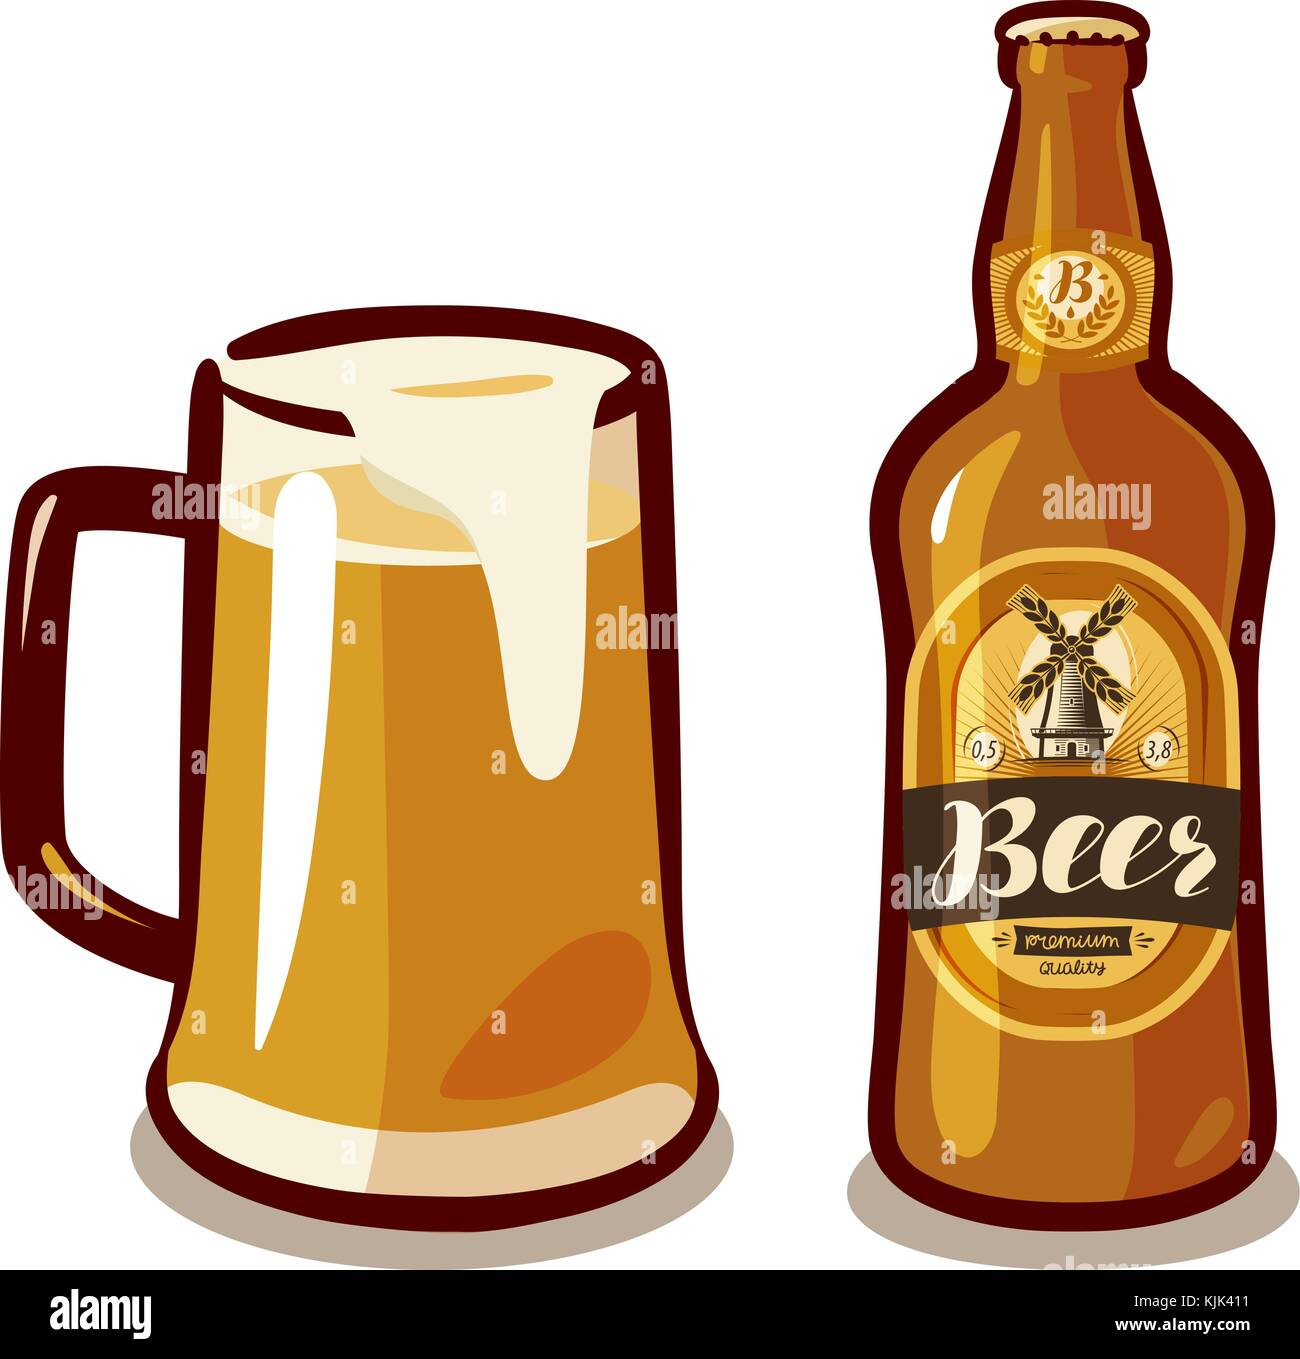 Craft Beer Mexico City